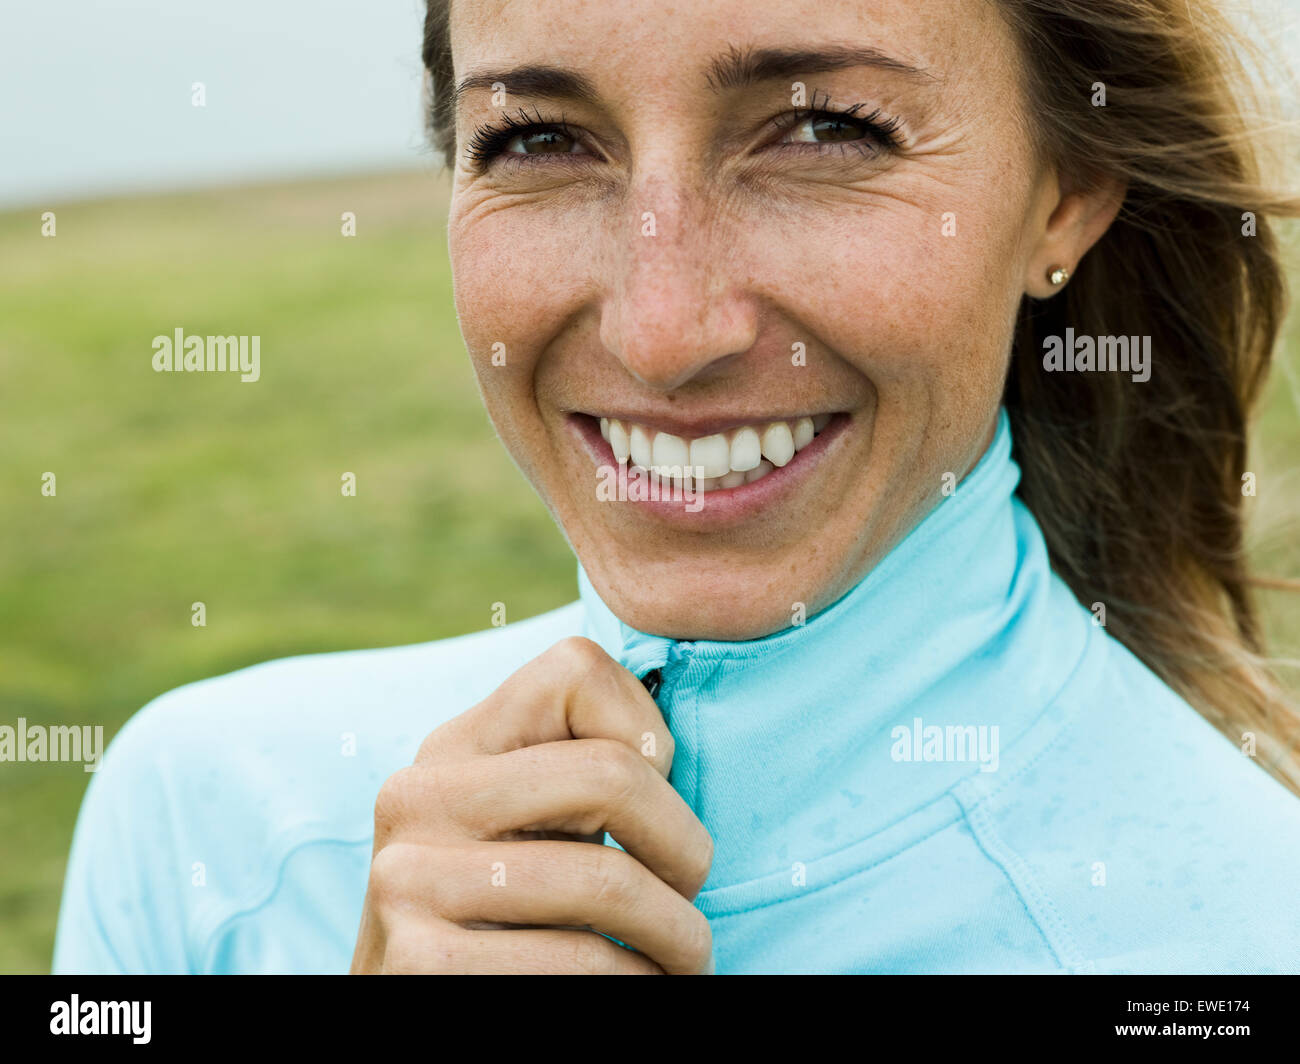 Porträt einer lächelnden jungen Frau jogger Stockbild